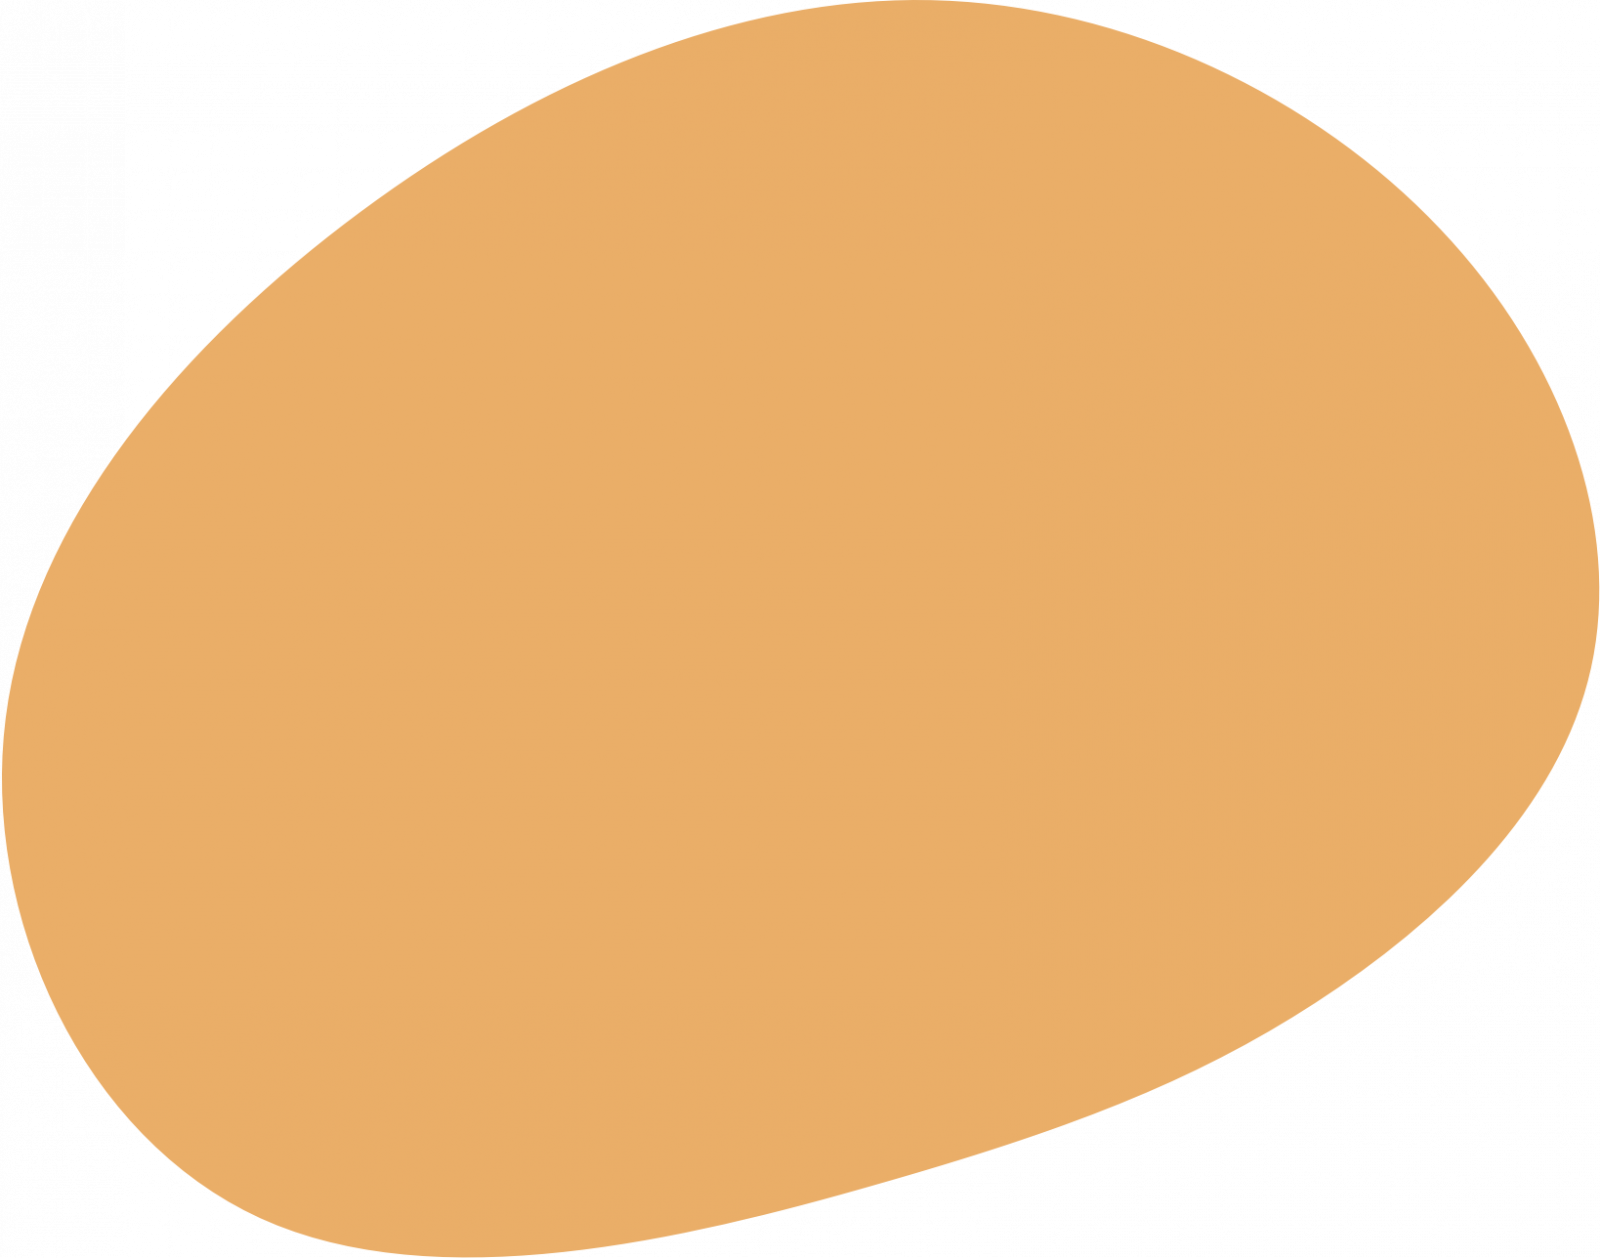 Orange-bg-pebble-1638x1288